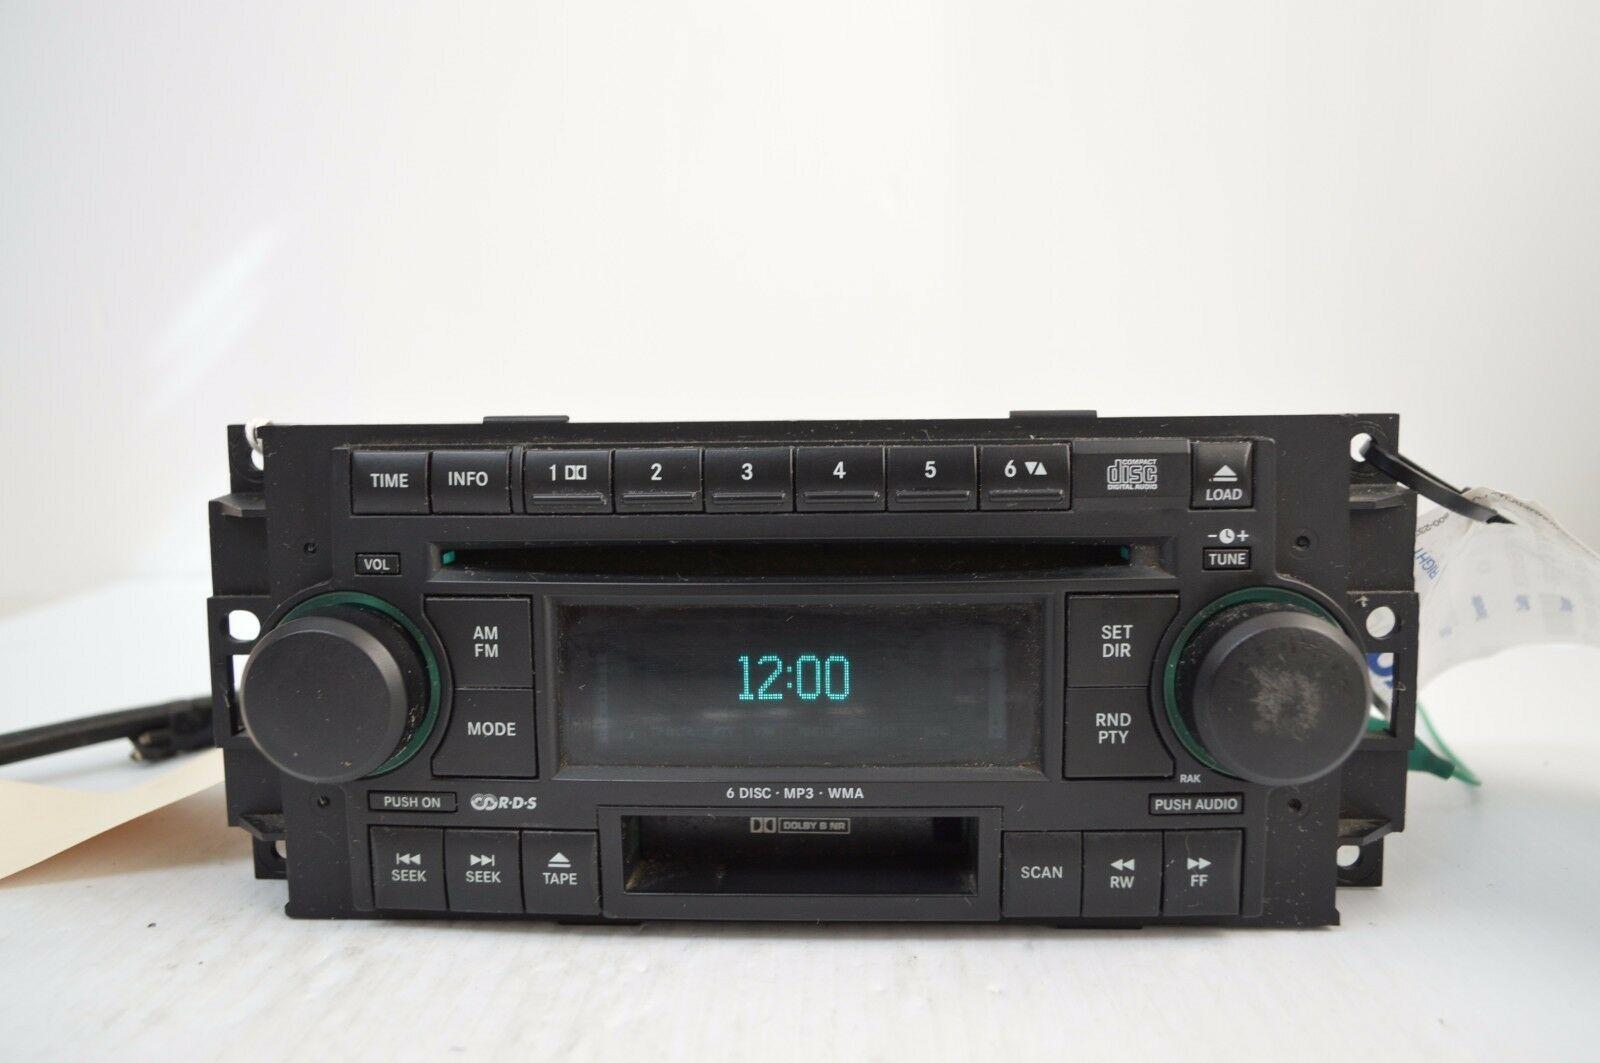 2005-2007 CHRYSLER DODGE RADIO 6 CD MP3 CASSETTE PLAYER TESTD 5091523AL AA36#016